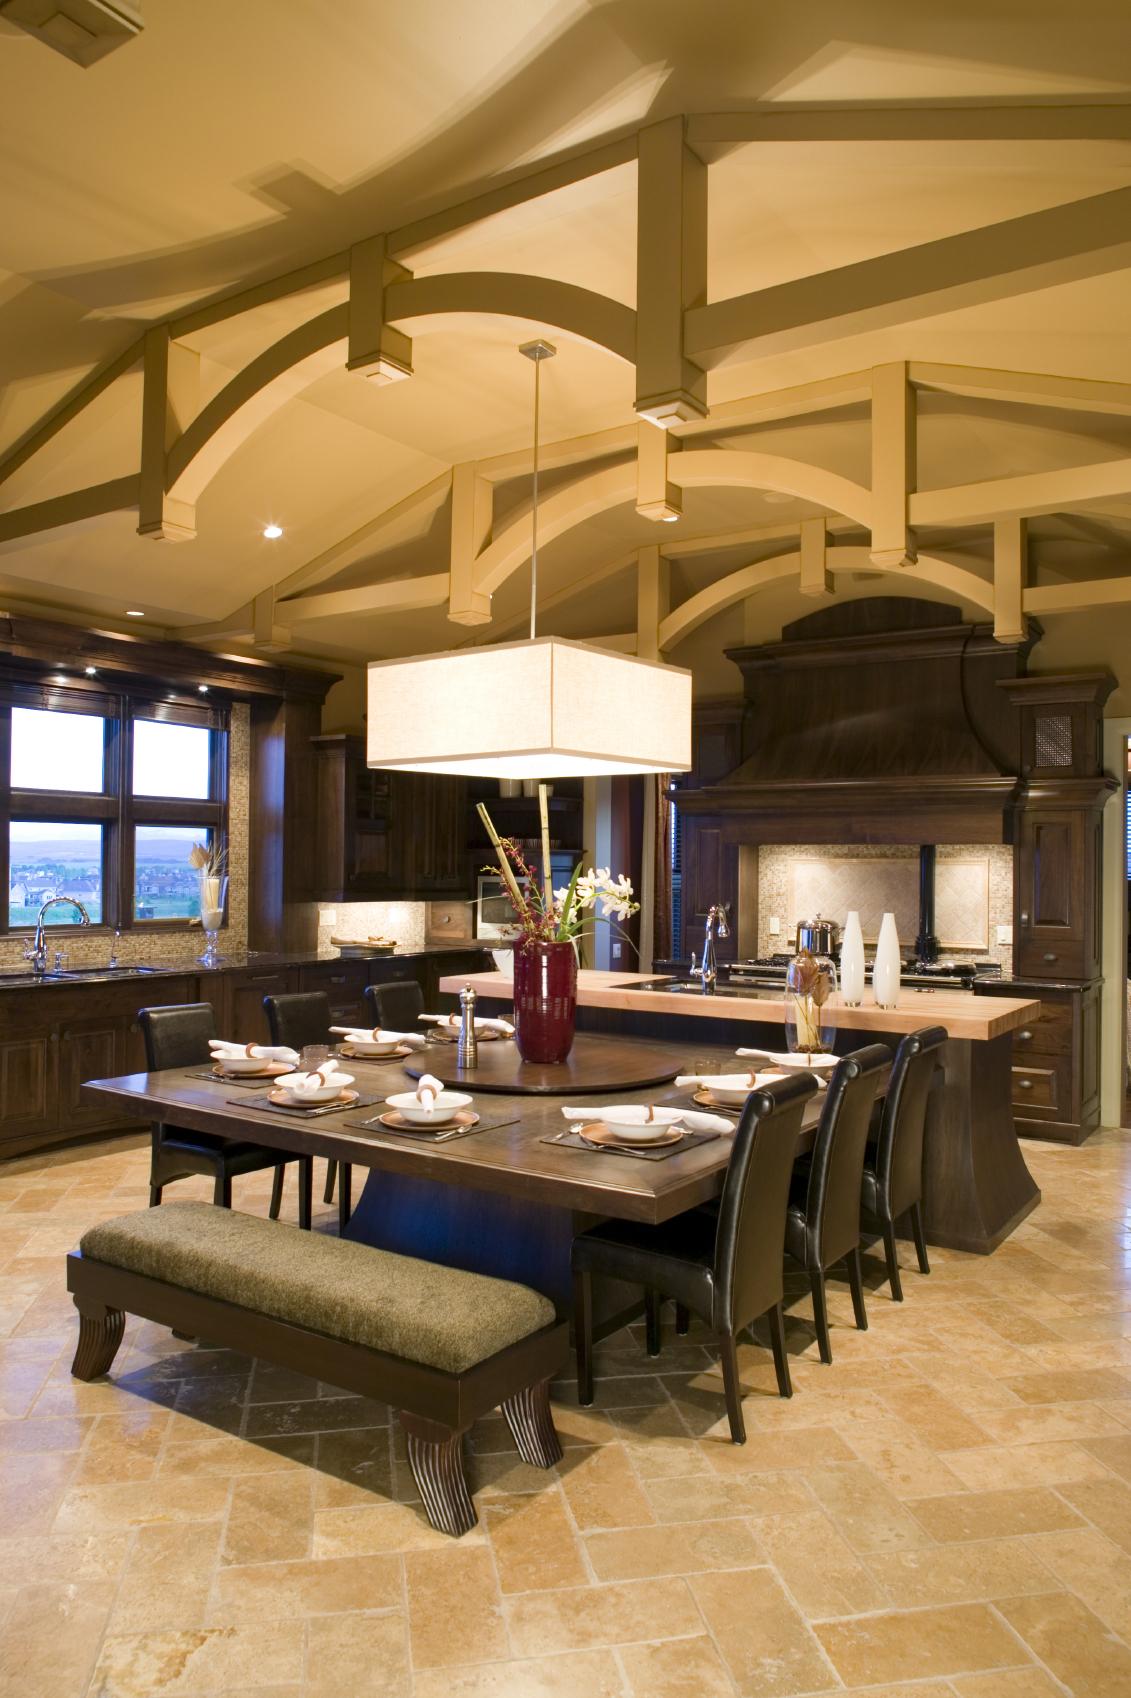 40 Uber Luxurious Custom Contemporary Kitchen Designs : iStock000006923578Medium from www.homestratosphere.com size 1131 x 1698 jpeg 2180kB